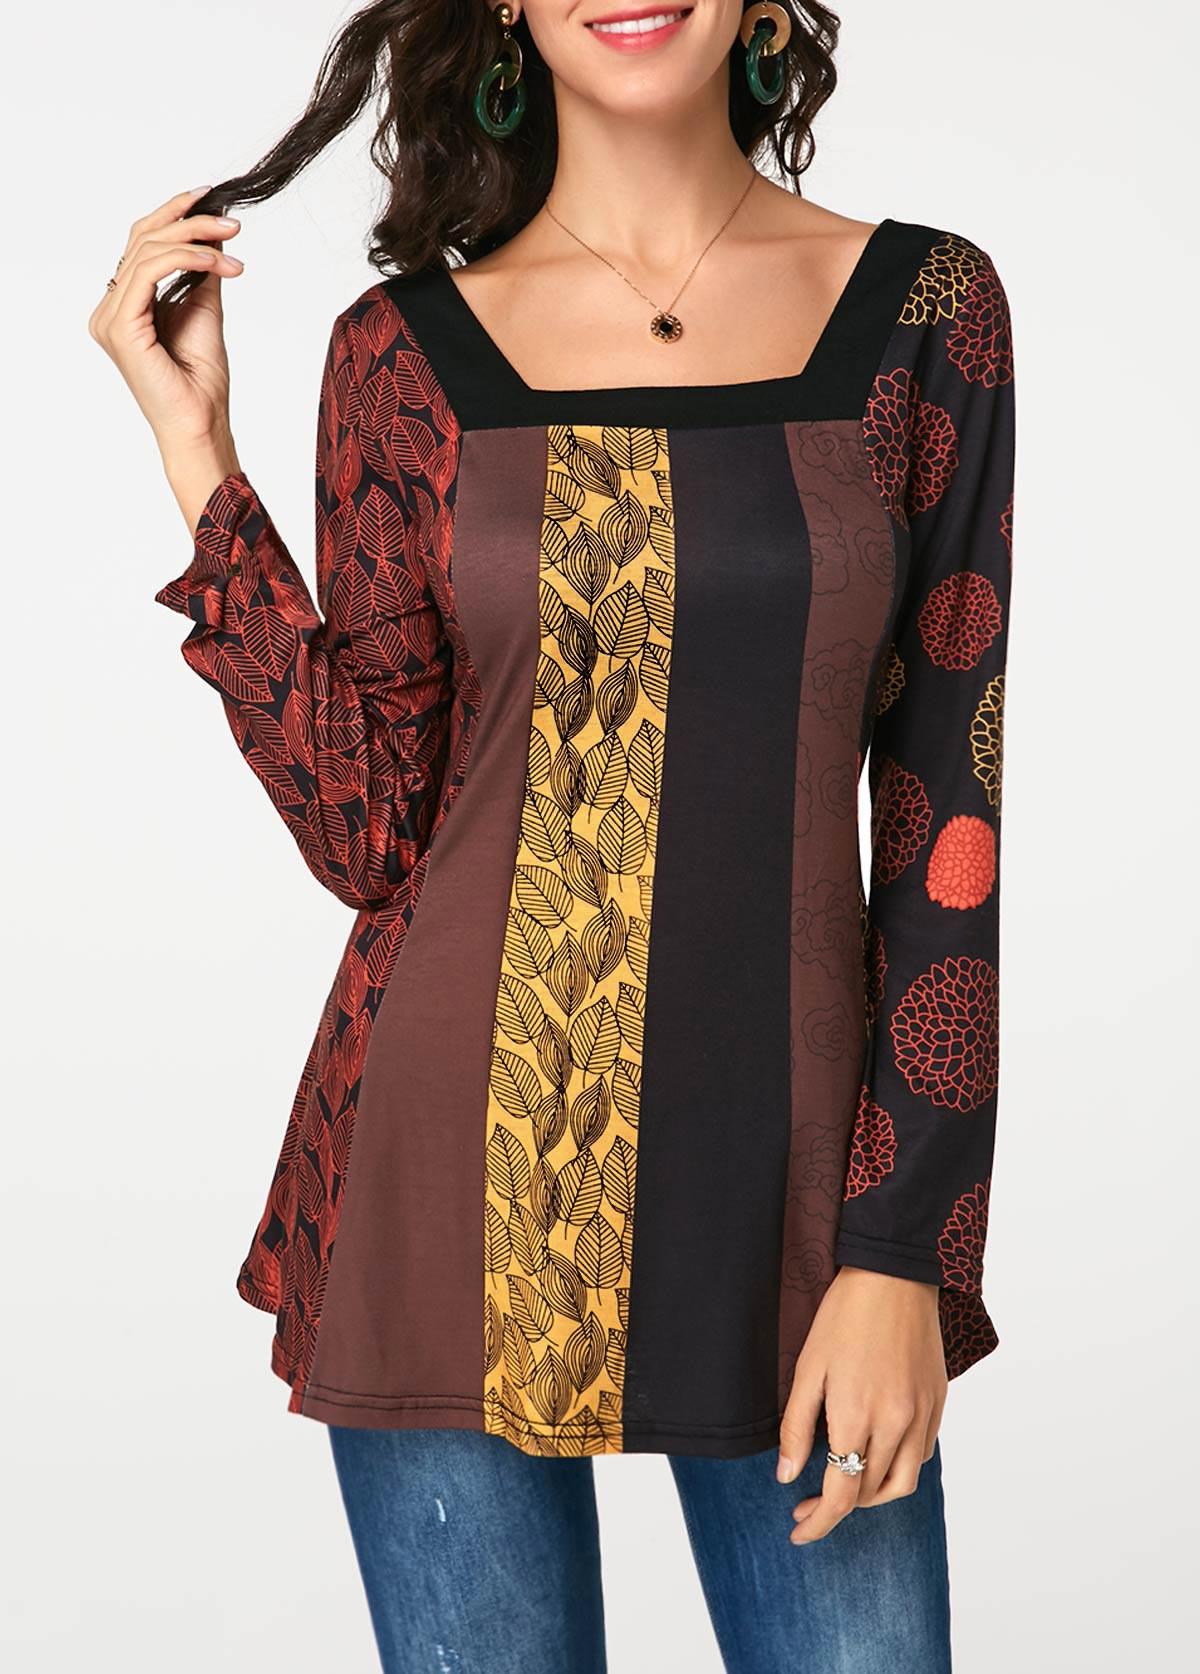 ROTITA Printed Long Sleeve Square Neck T Shirt